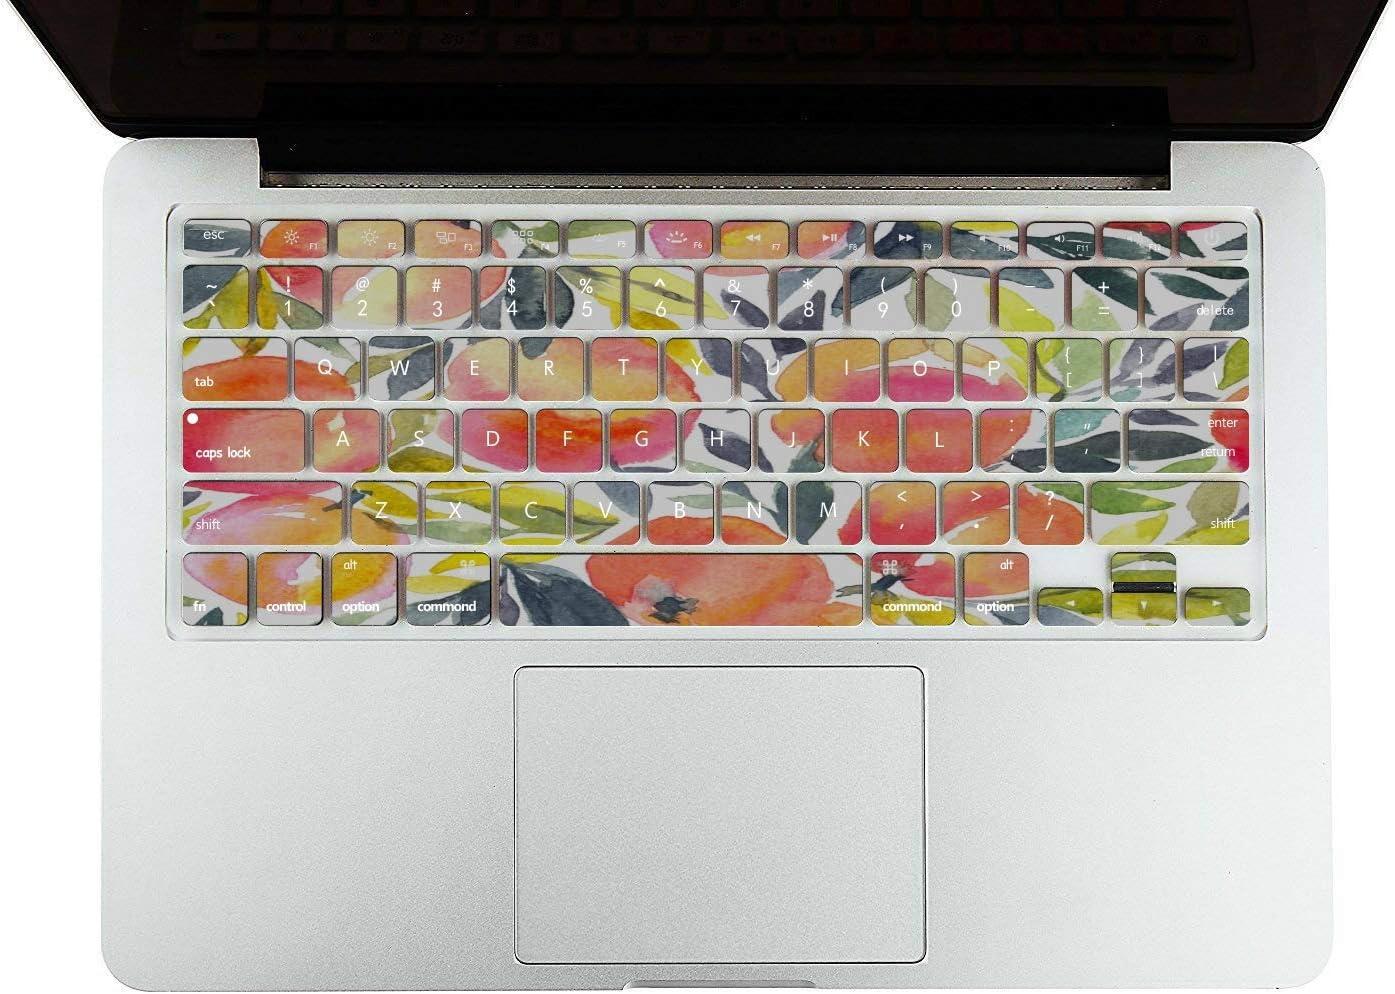 MacBook Air Case 13 Summer Pink Creative Fruit Peach Plastic Hard Shell Compatible Mac Air 11 Pro 13 15 MacBook Air 13 Case Protection for MacBook 2016-2019 Version